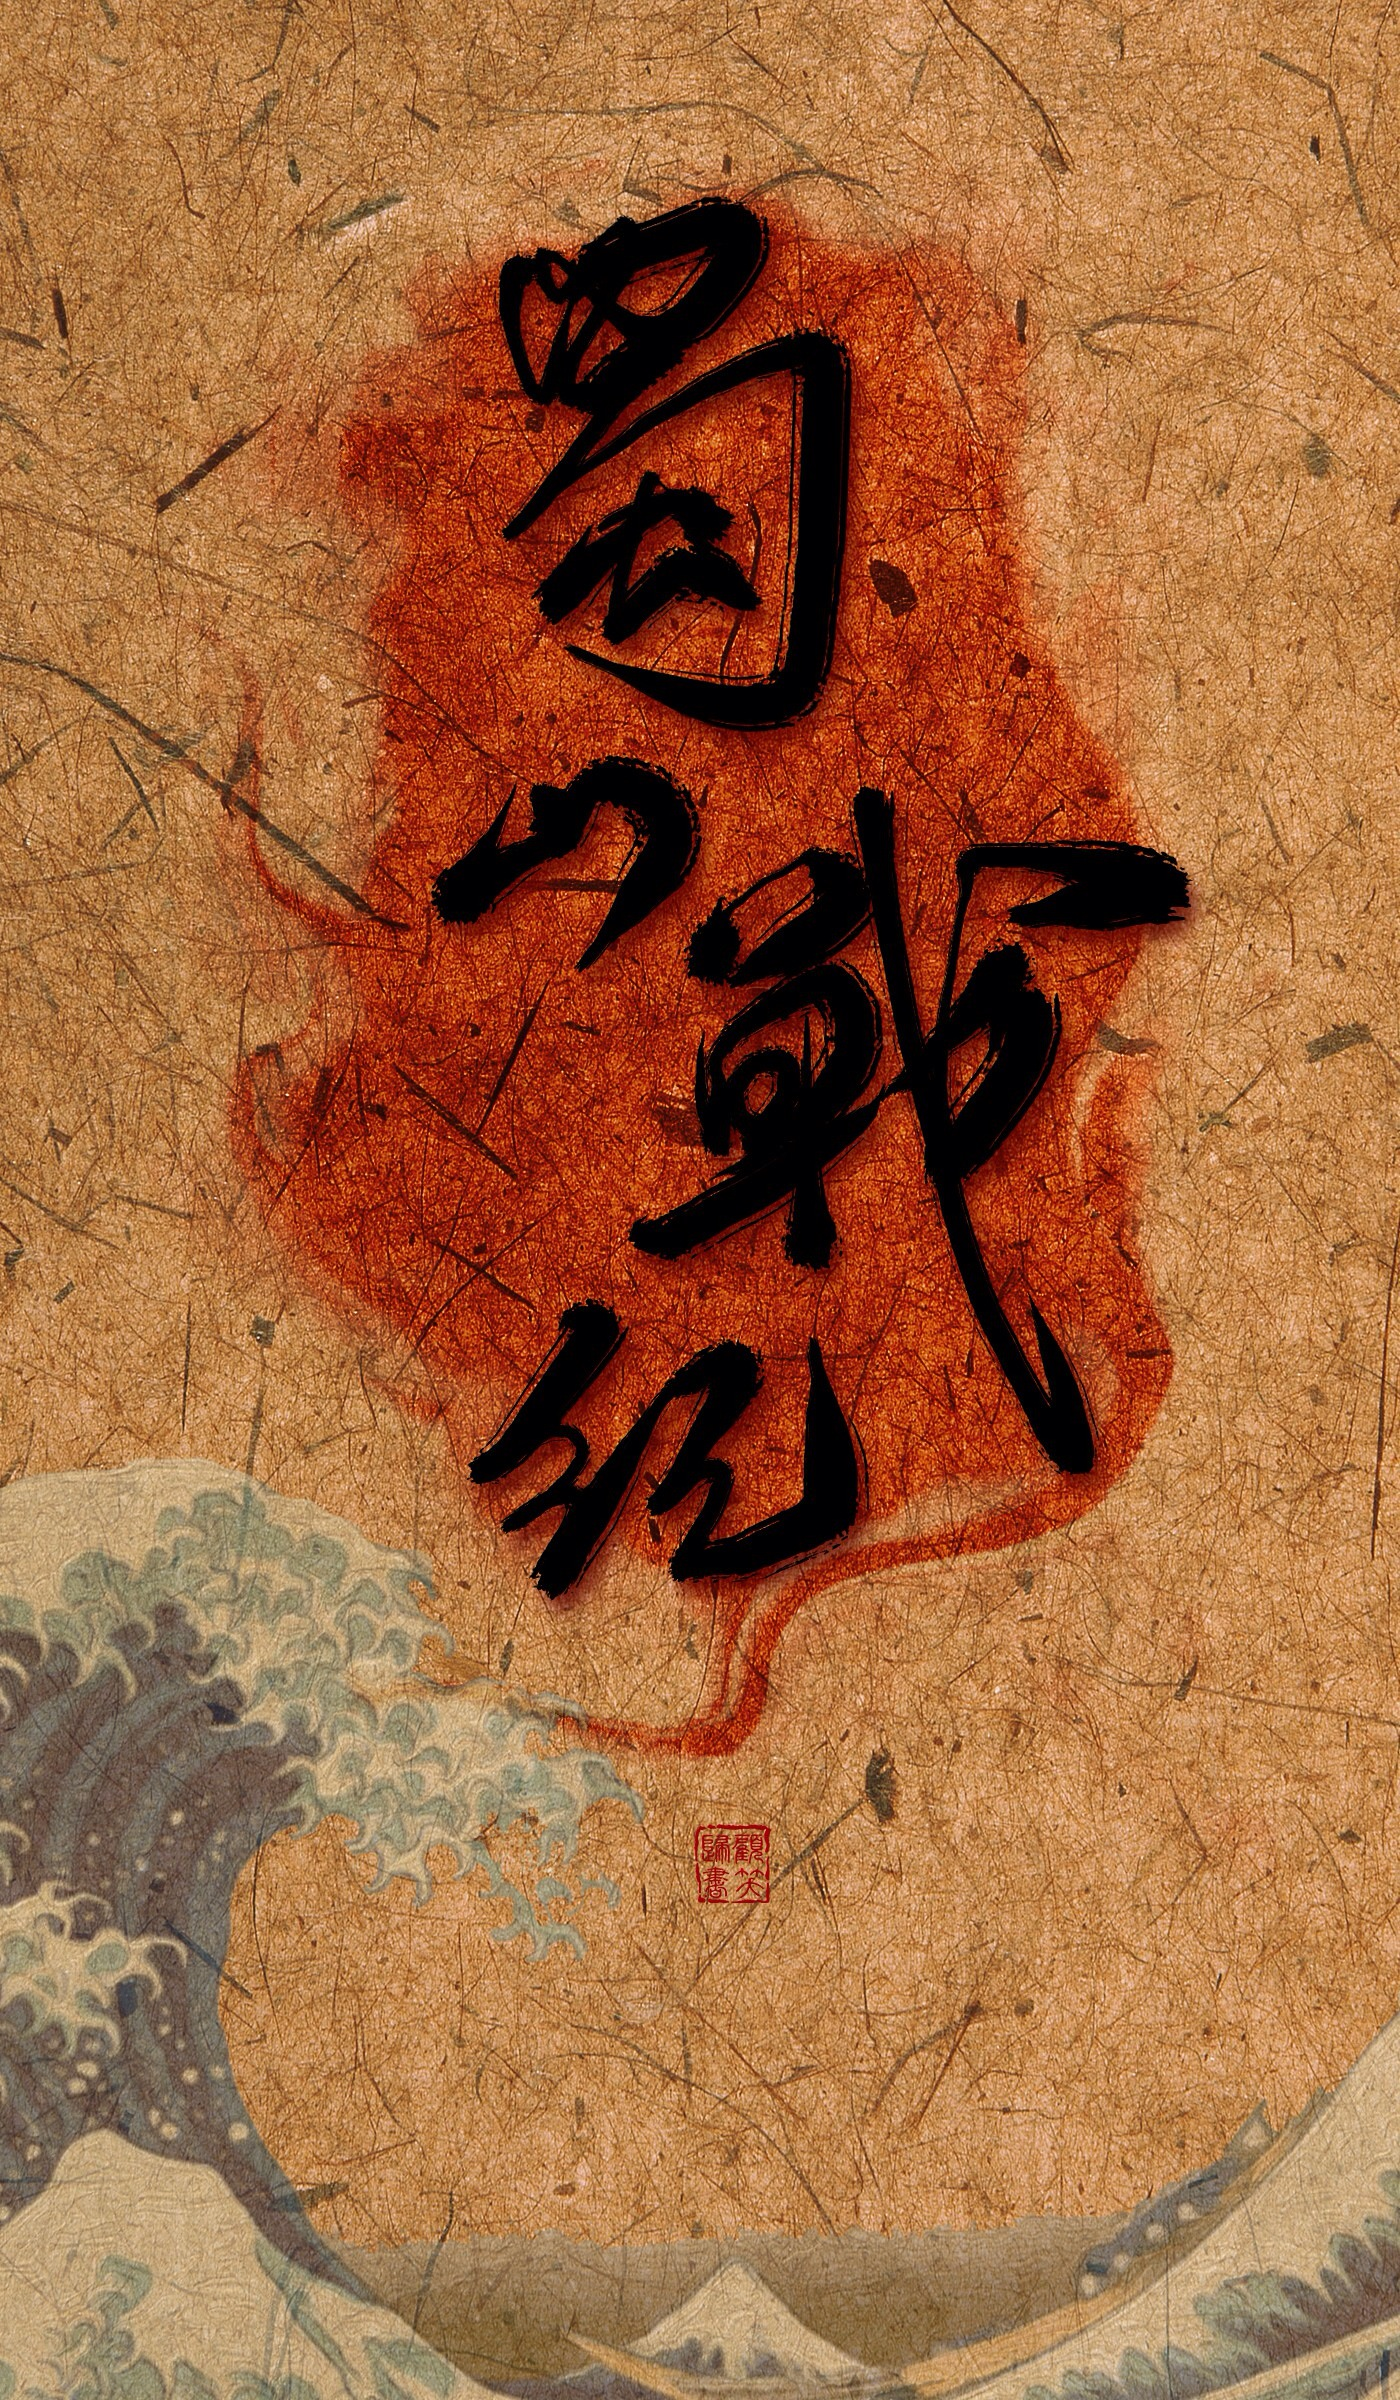 دانلود زیرنویس فارسی سریال The Legend of Zu